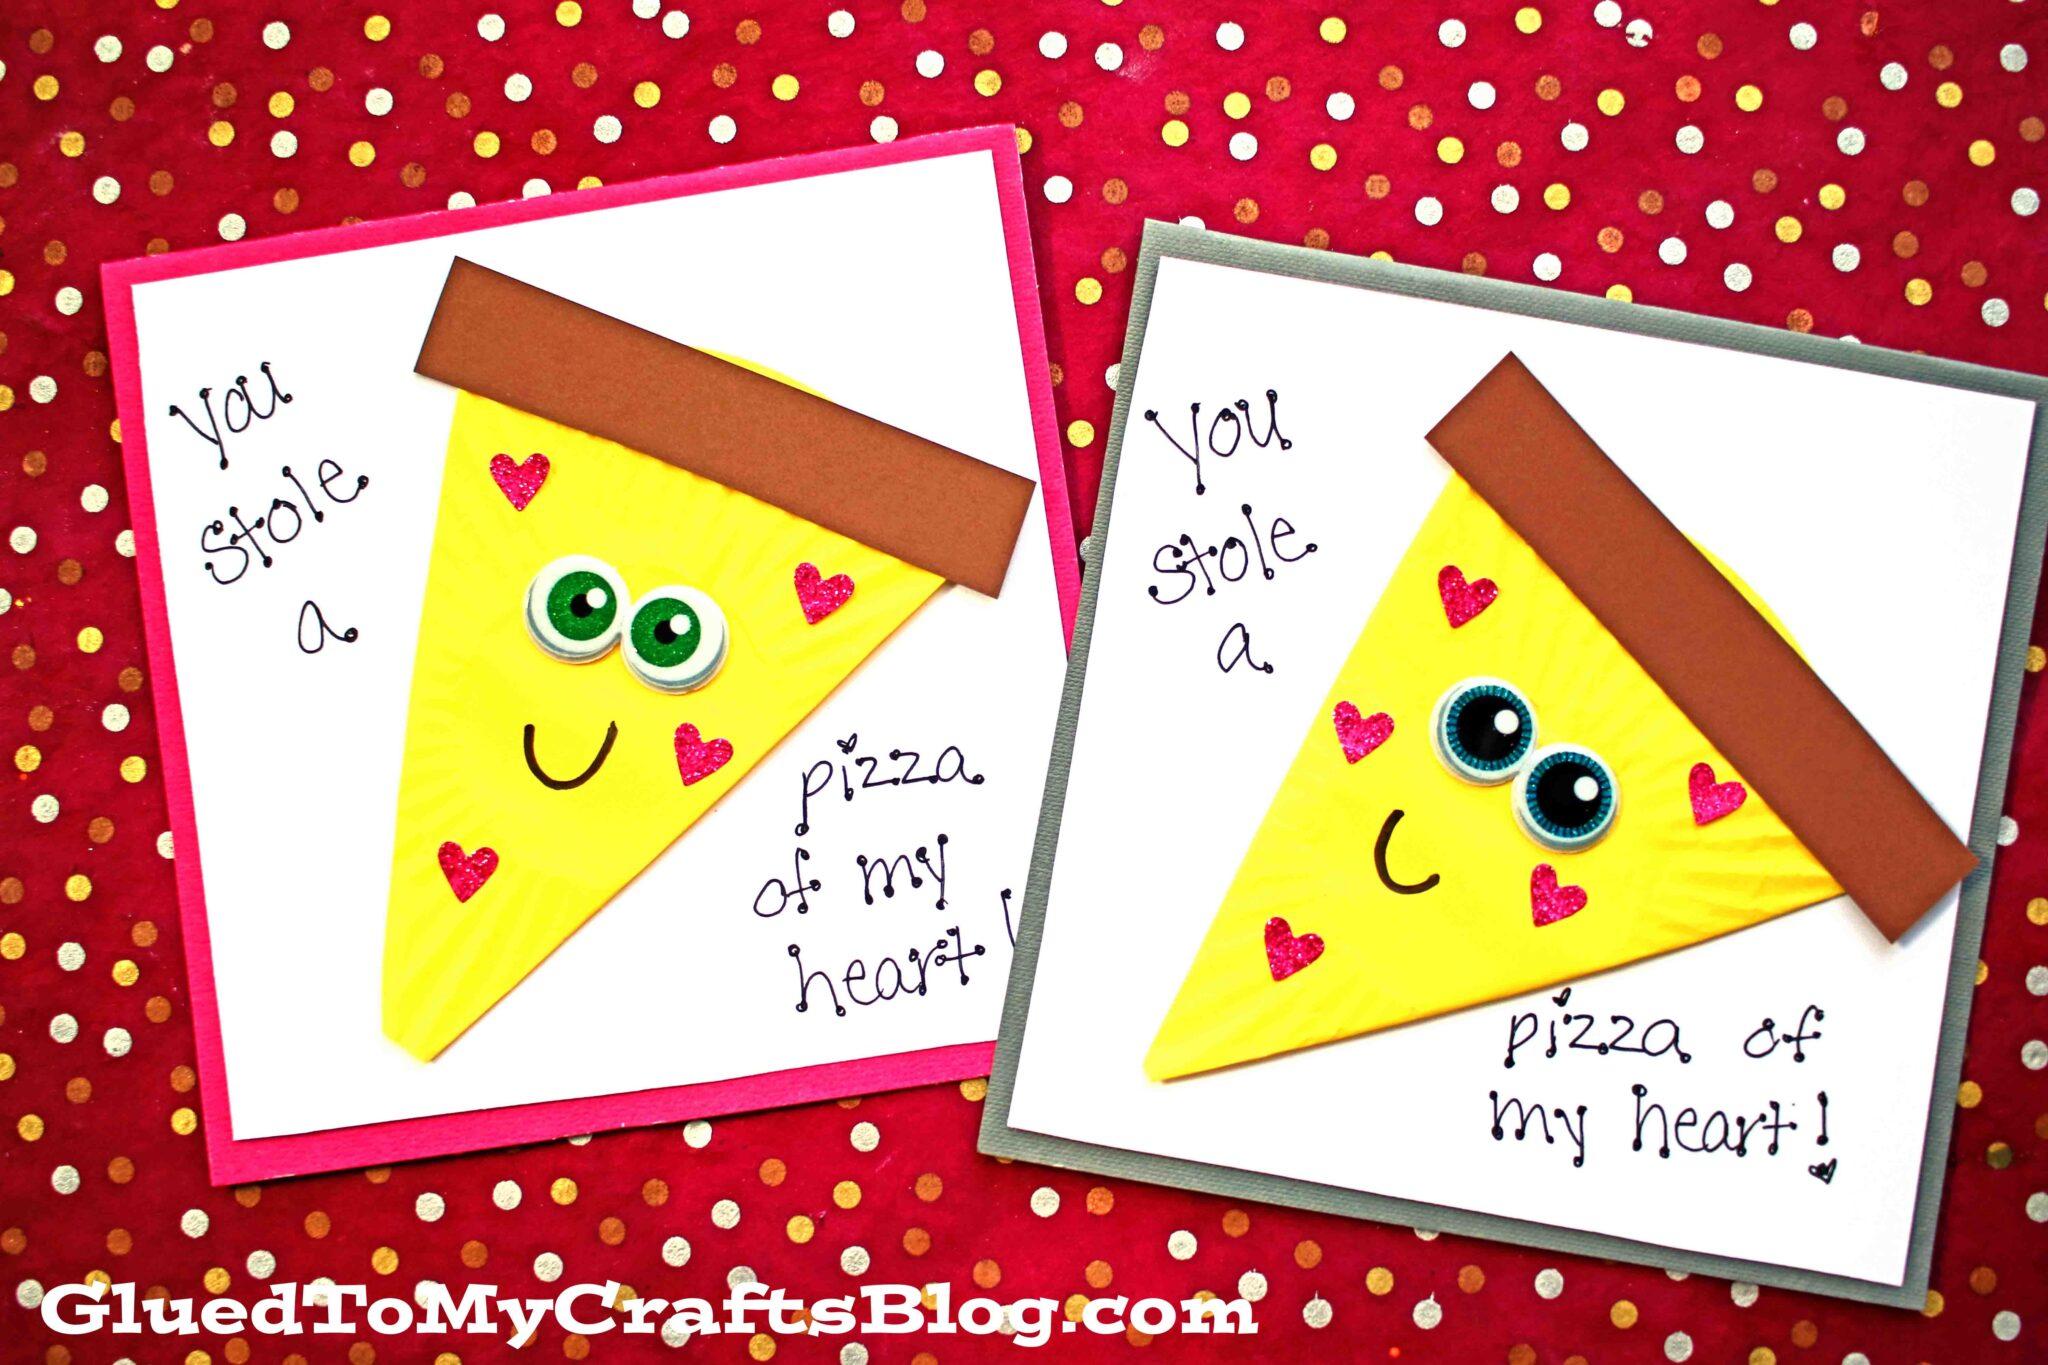 diy cupcake liner valentine pizza card tutorial for kids